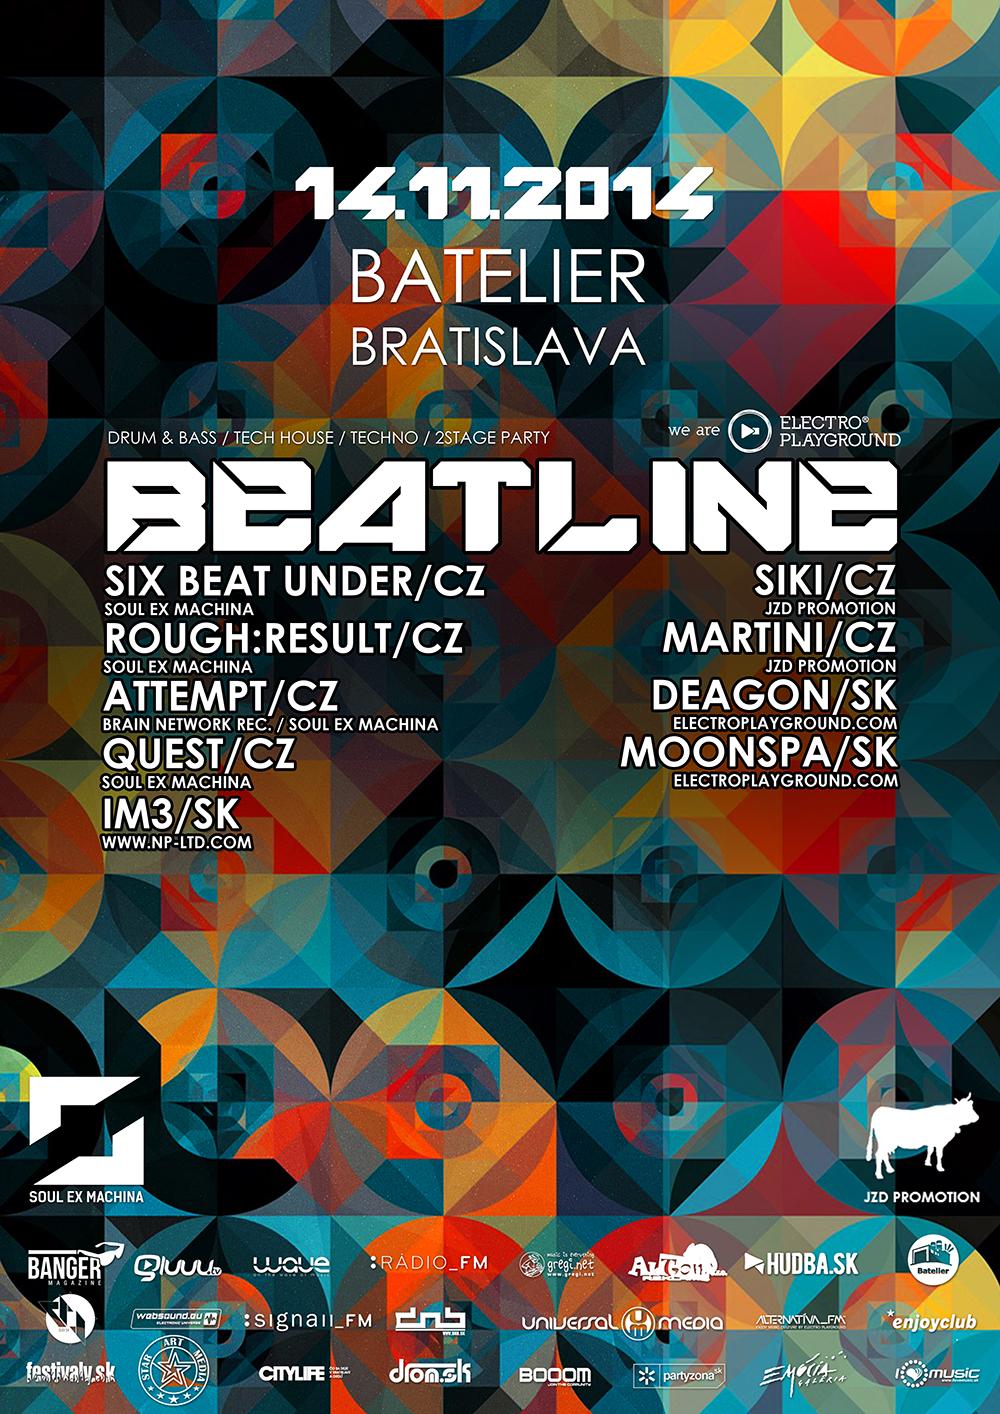 Beatlien 5 – predstavenie lineup-u